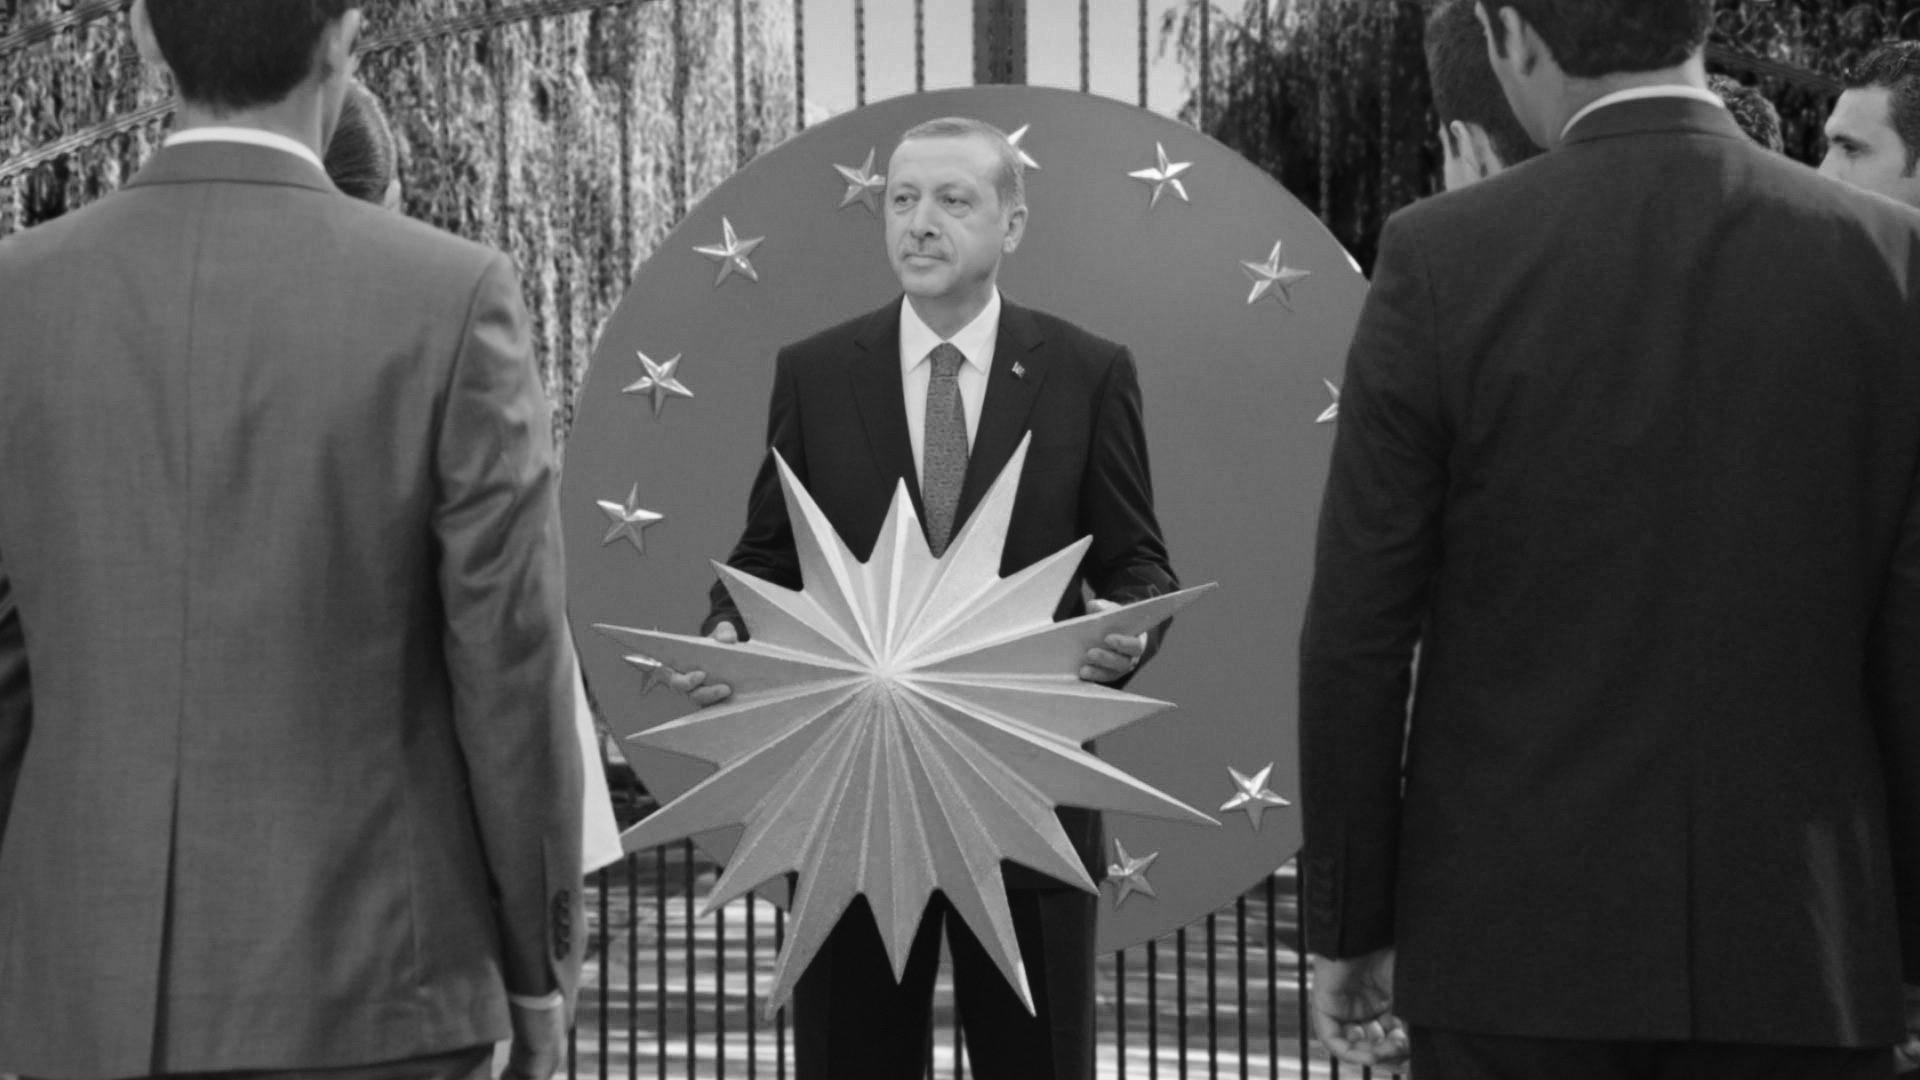 cumhurbaşkani-forsu-ve-recep-tayyip-erdoğan-reklam-filmi.20140805125825